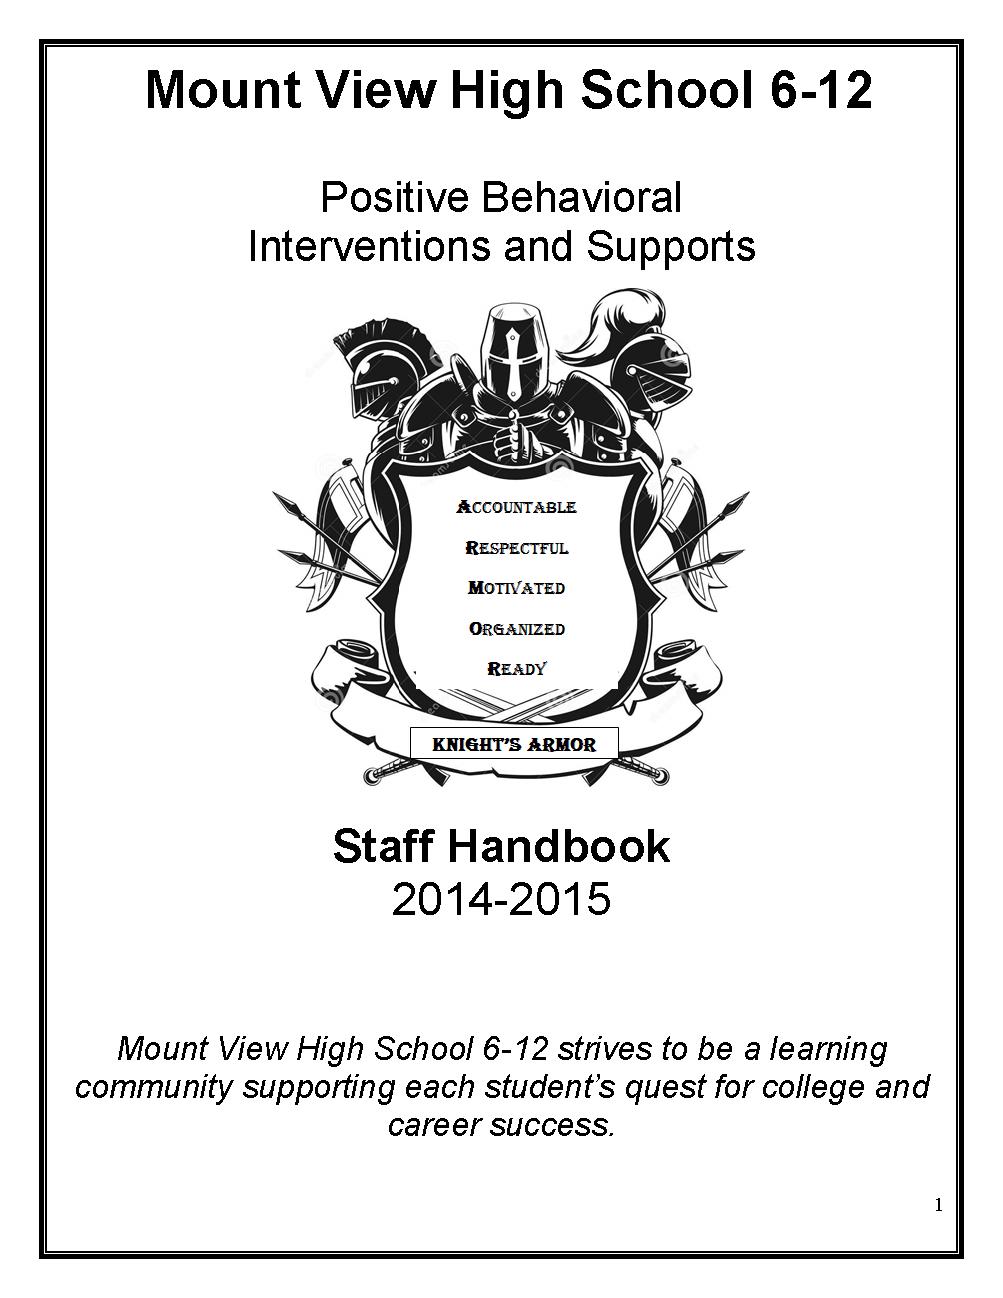 MVHS PBIS Staff Handbook Cover